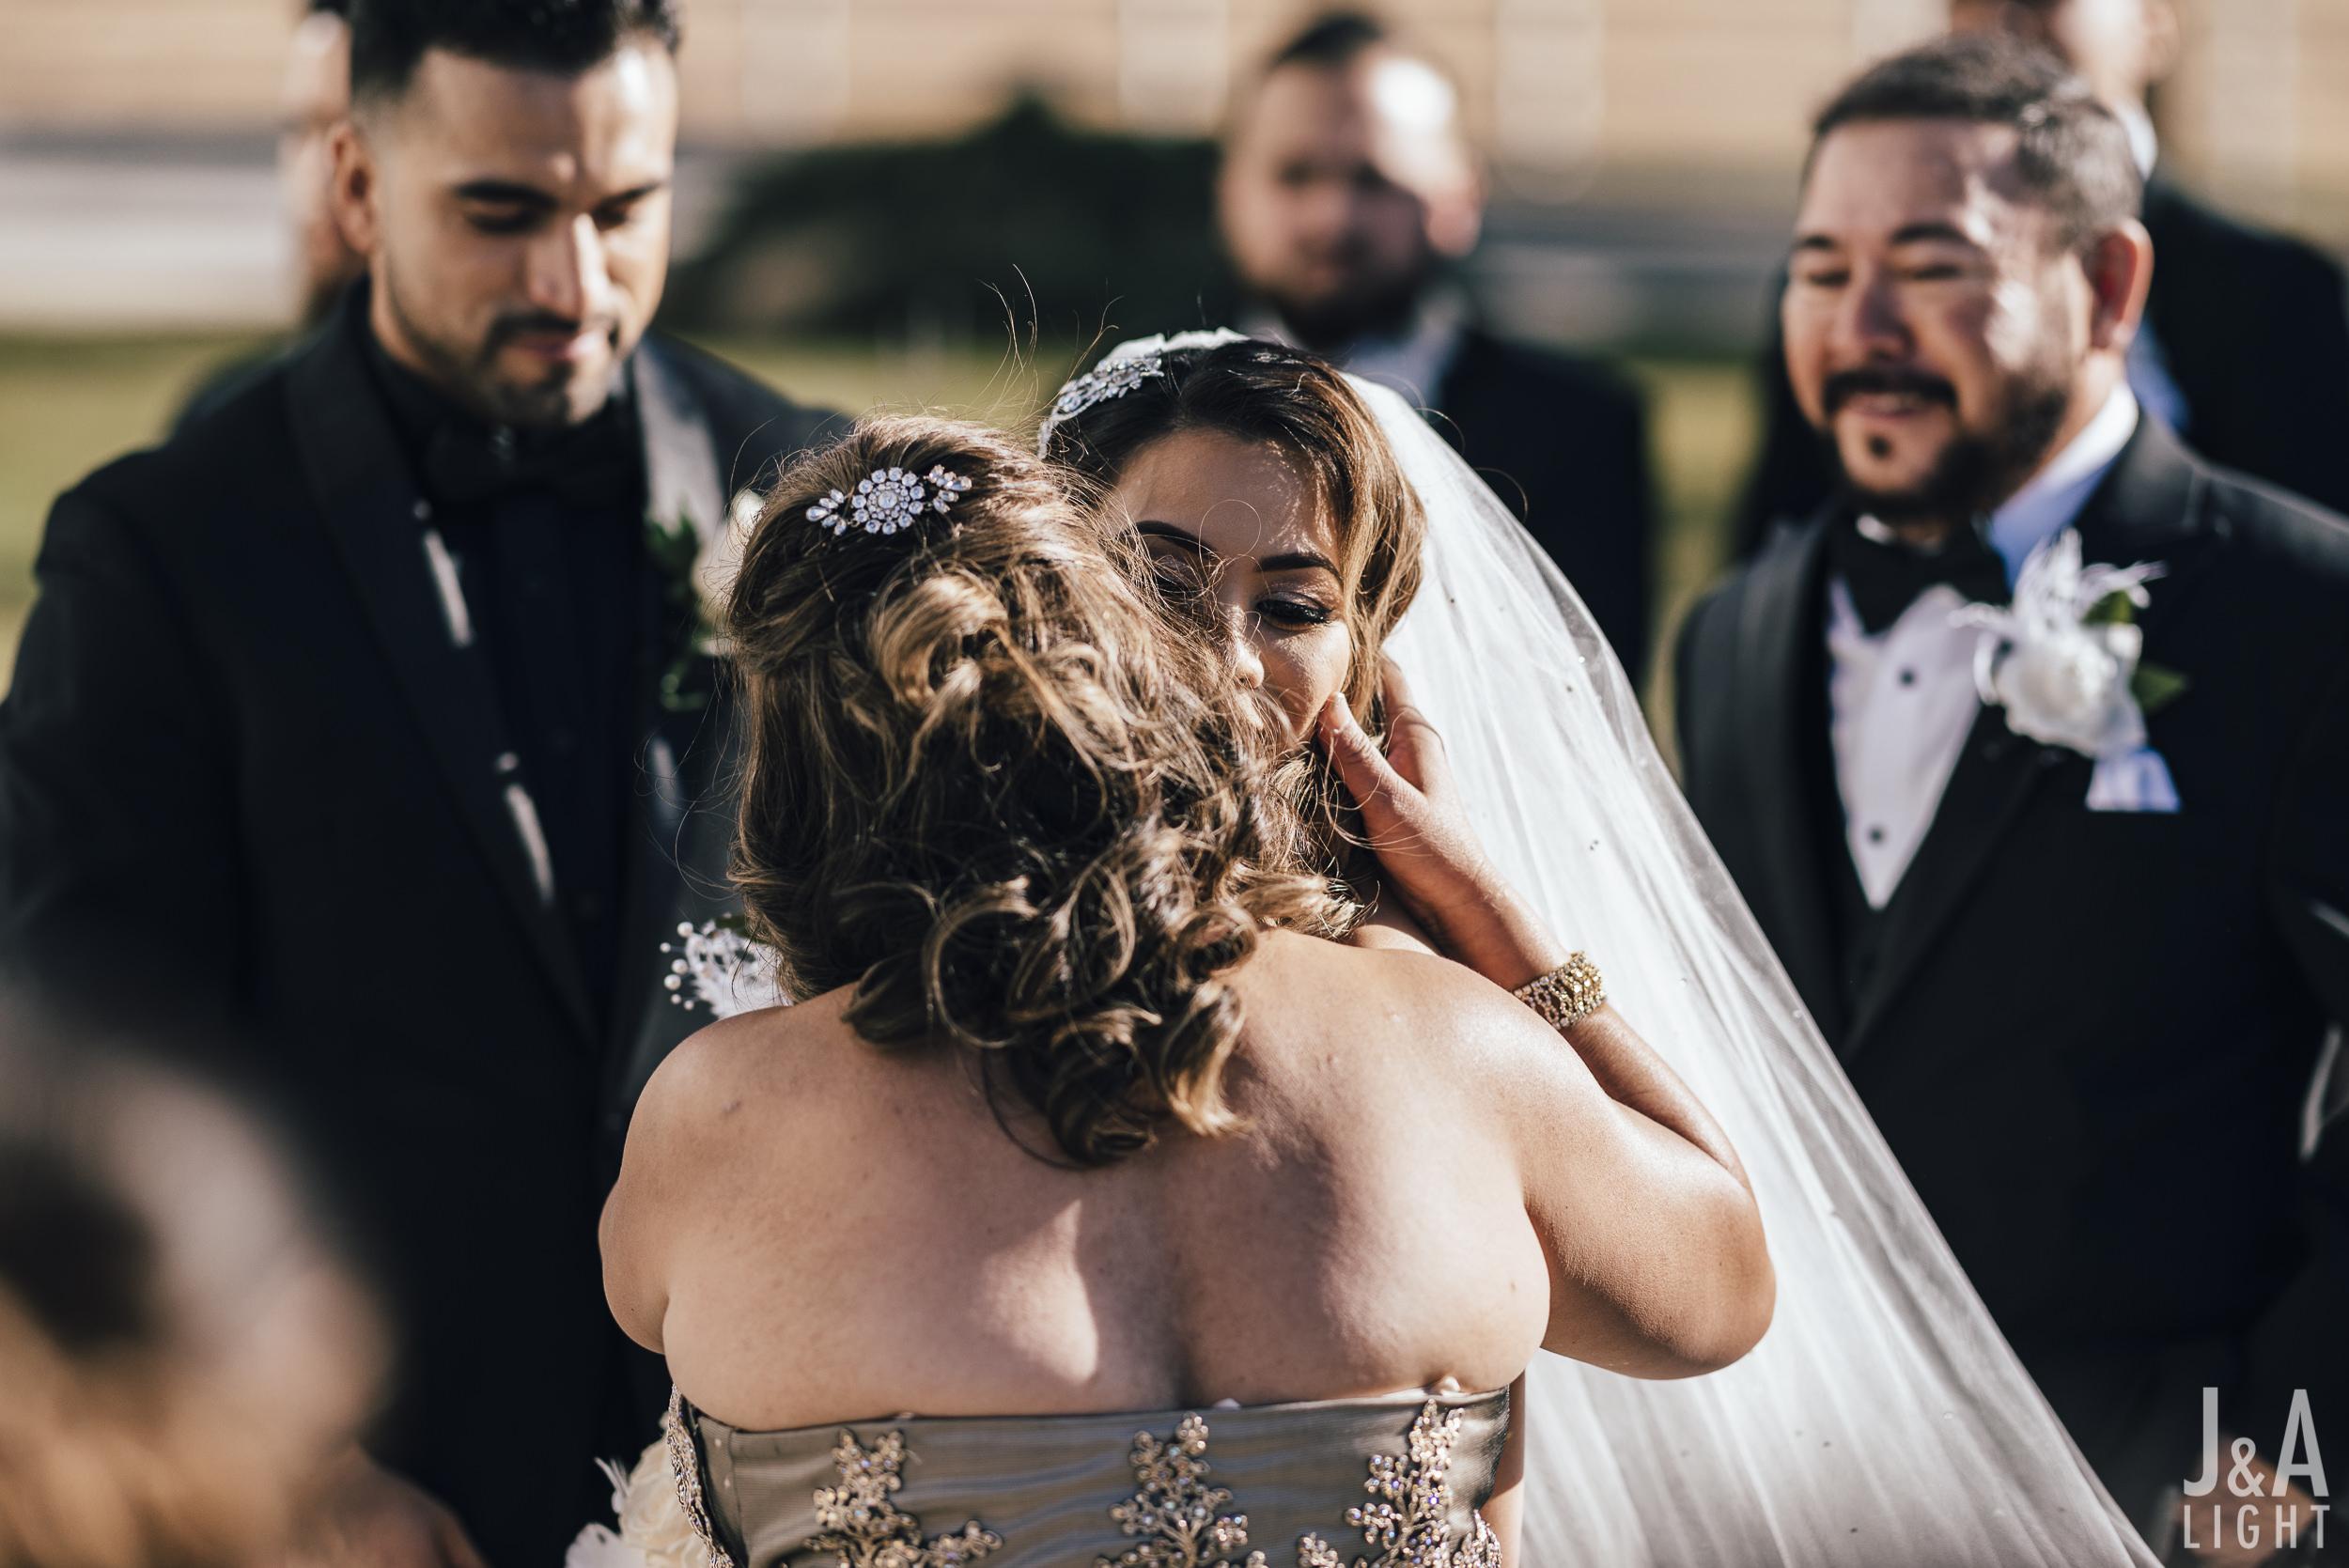 20171014-JanDan-LosBanos-GlassMansion-Wedding-Blog-035.jpg